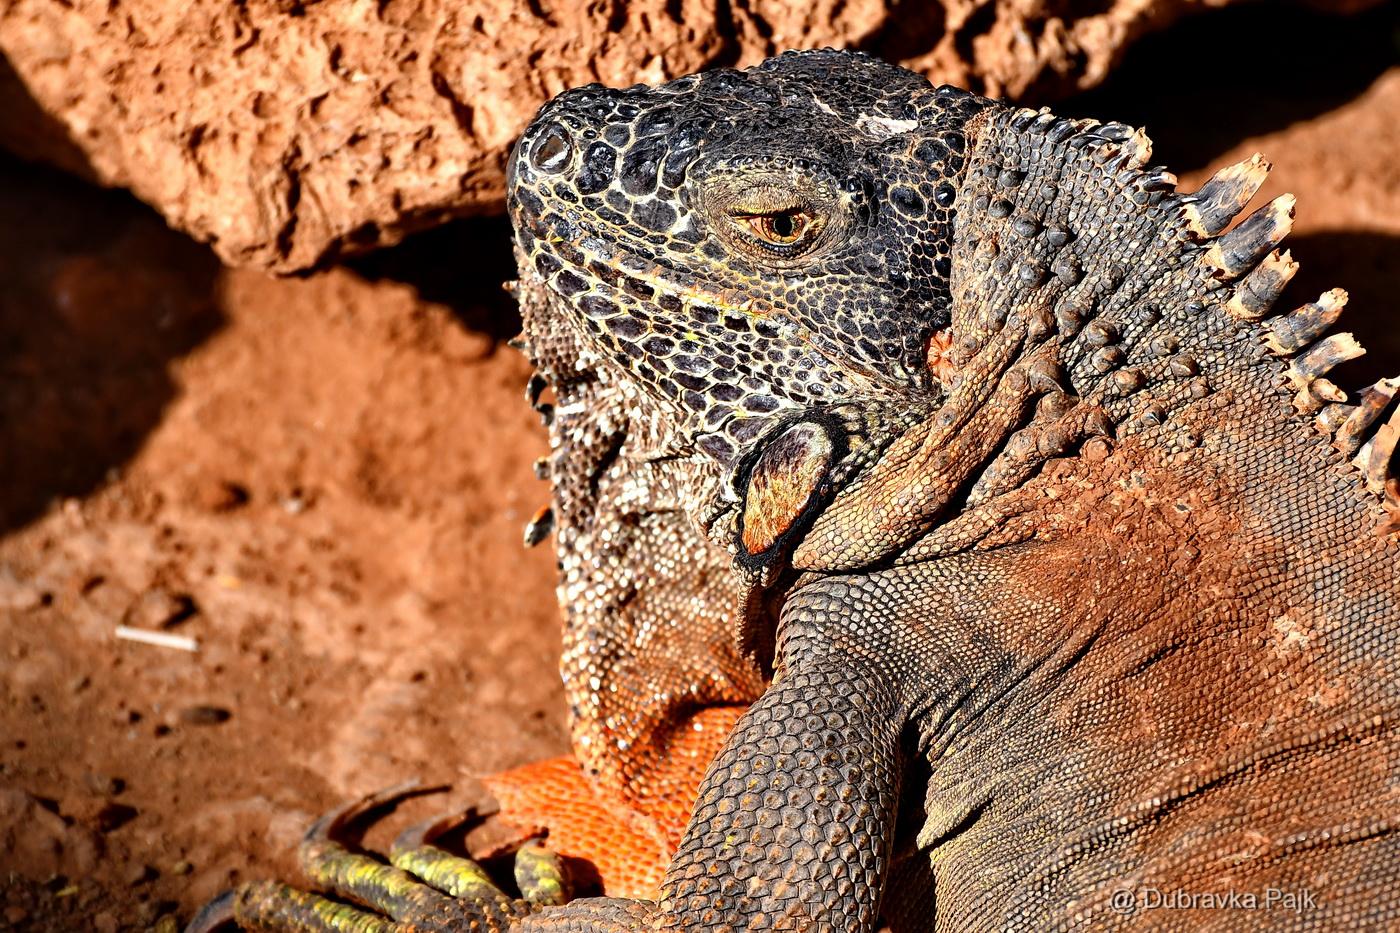 Tenerife, Canary Islands – Los Cristianos – Iguanas